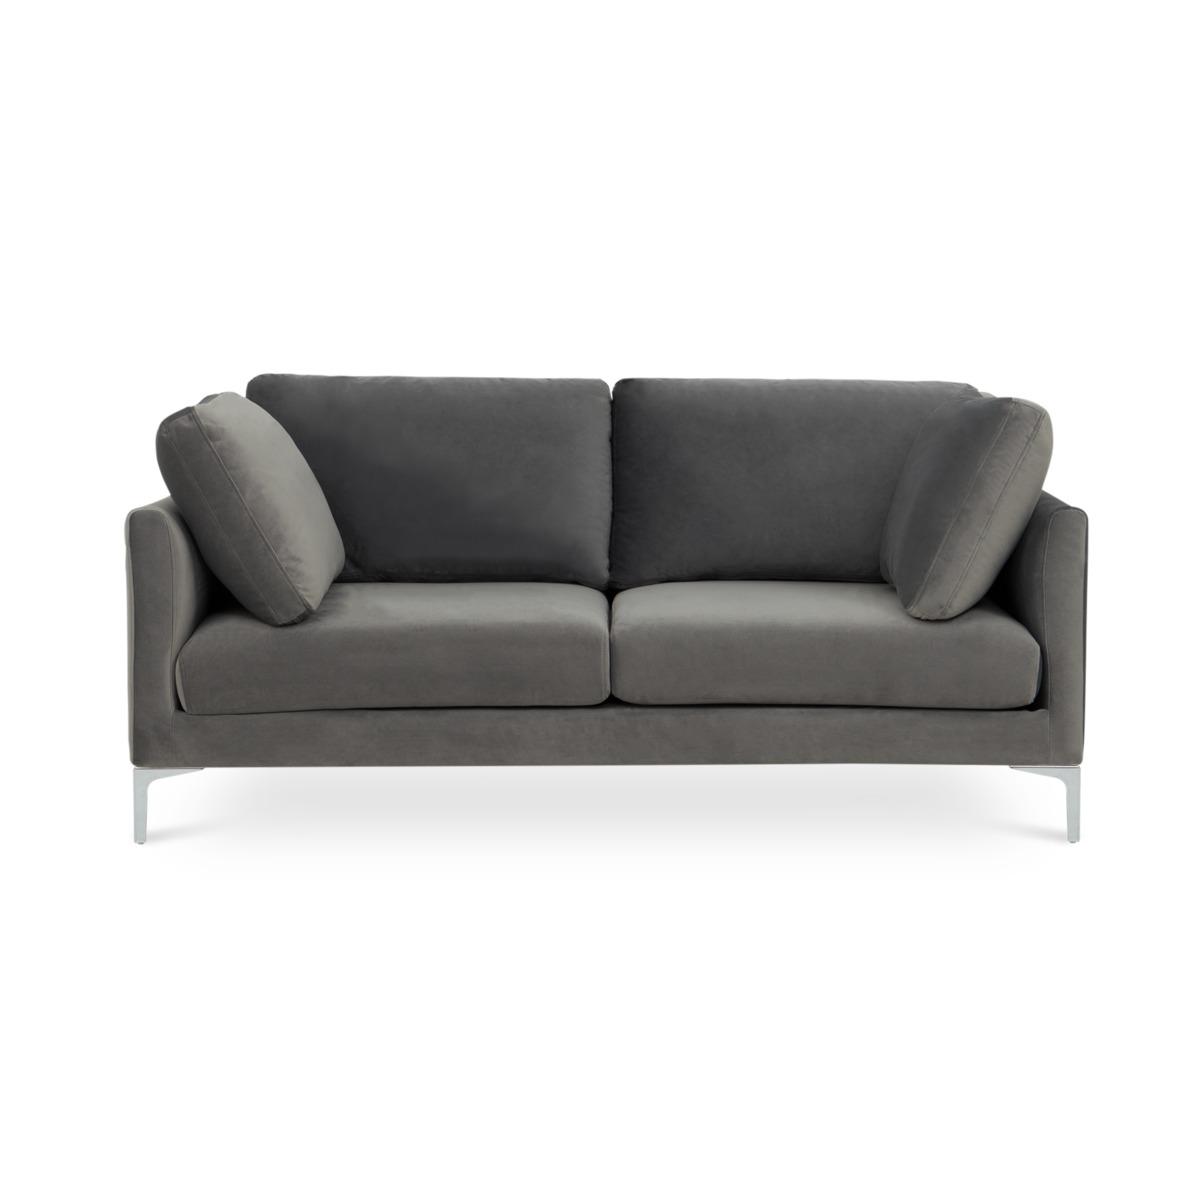 Adams 2 Seater Sofa, Fog Grey Velvet (Silver Leg)